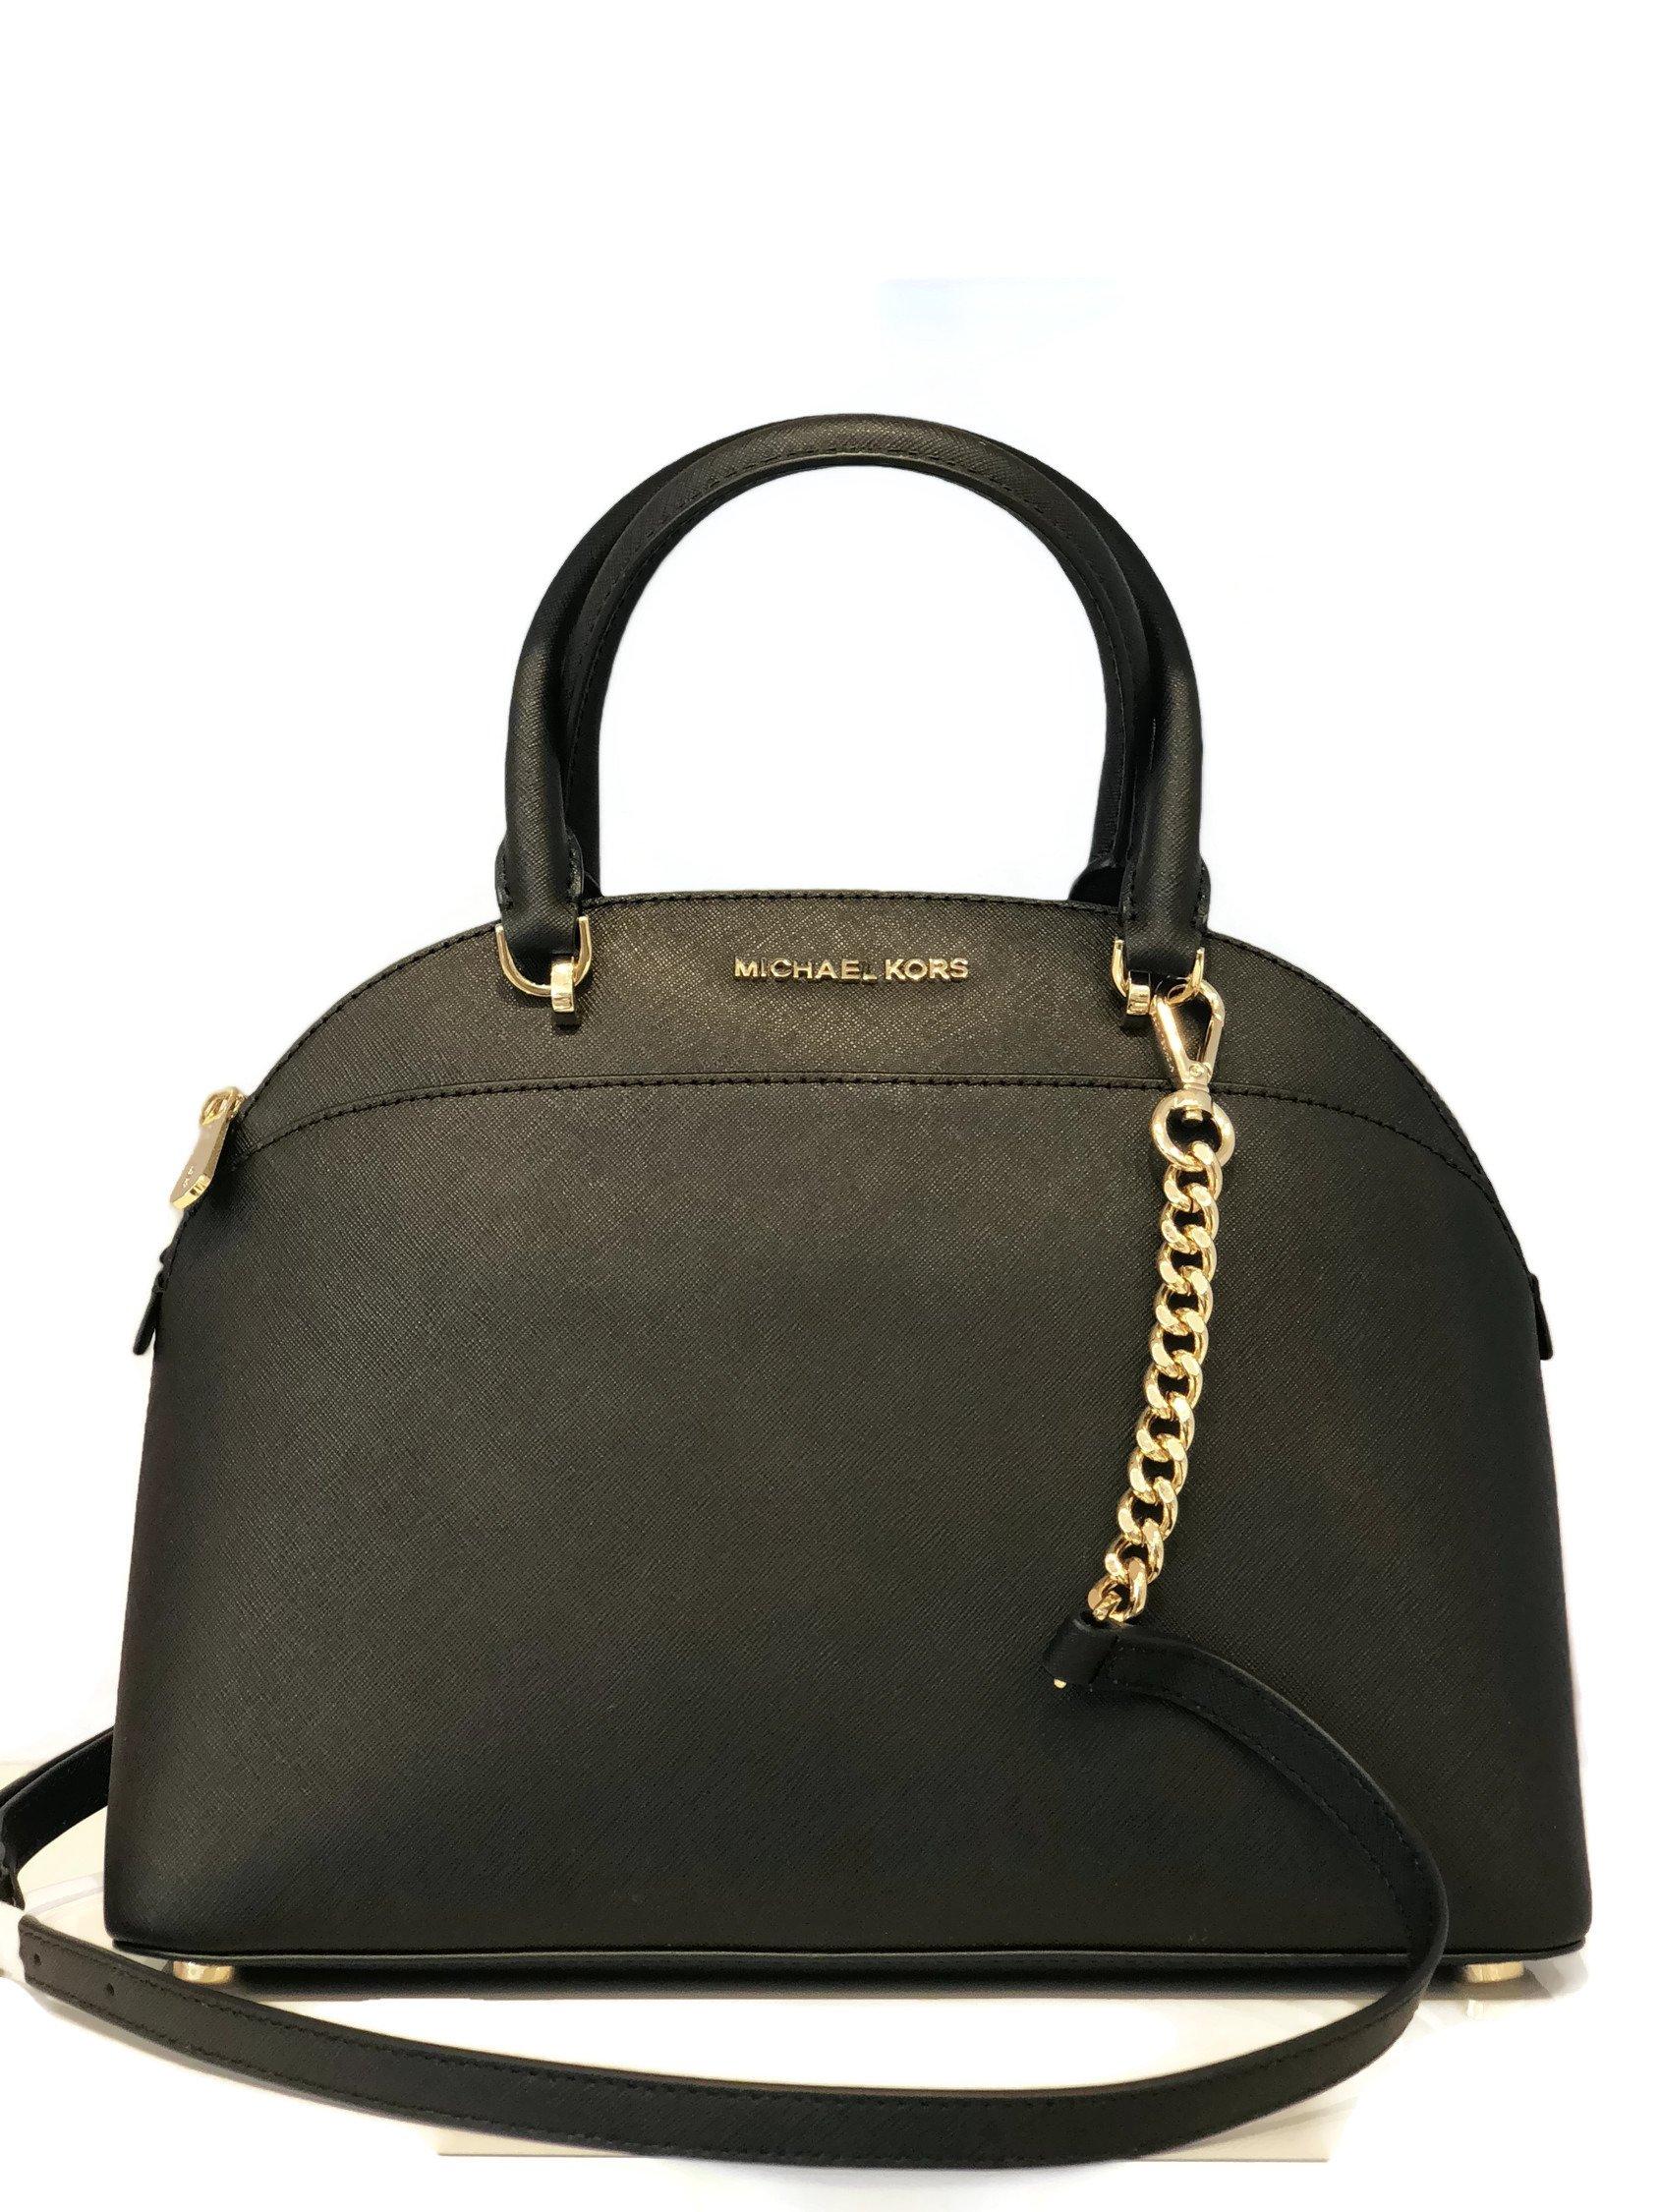 MICHAEL Michael Kors Large Dome Emmy Saffiano Leather Satchel Shoulder Handbag - Black